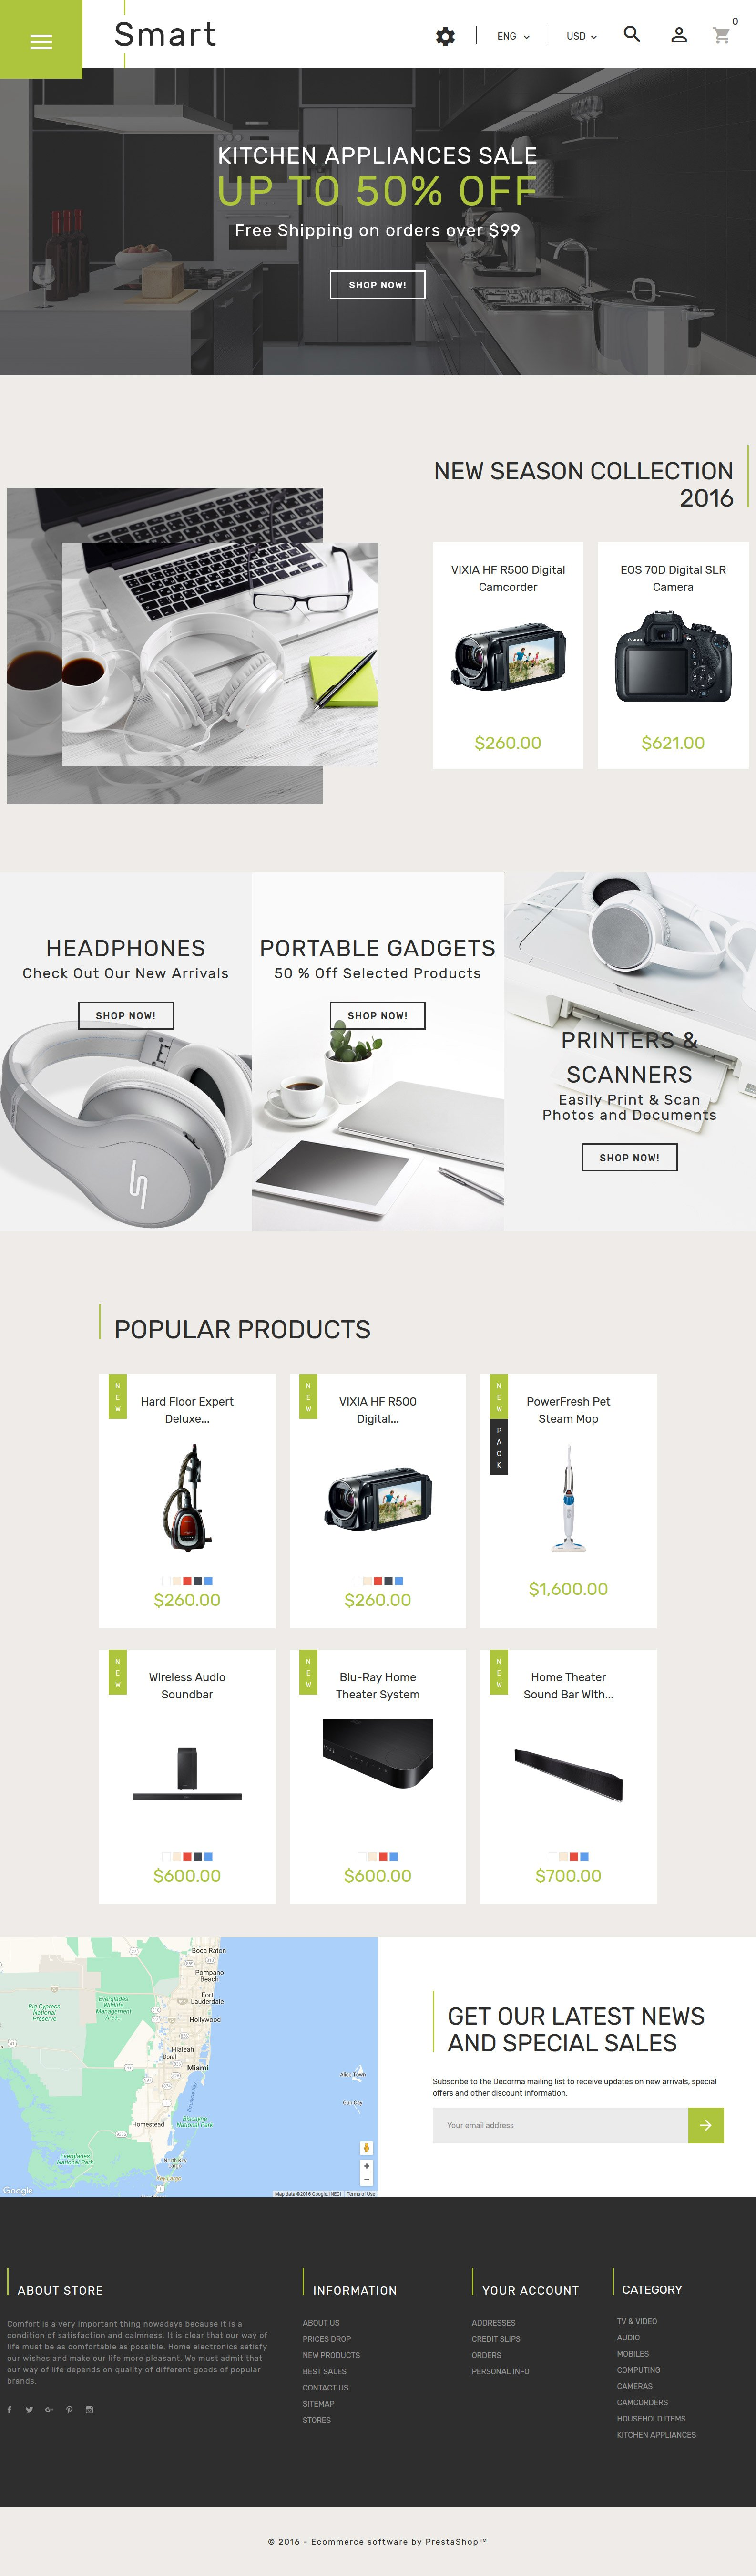 Responsivt Smart - Gadgets & Electronics PrestaShop-tema #61360 - skärmbild